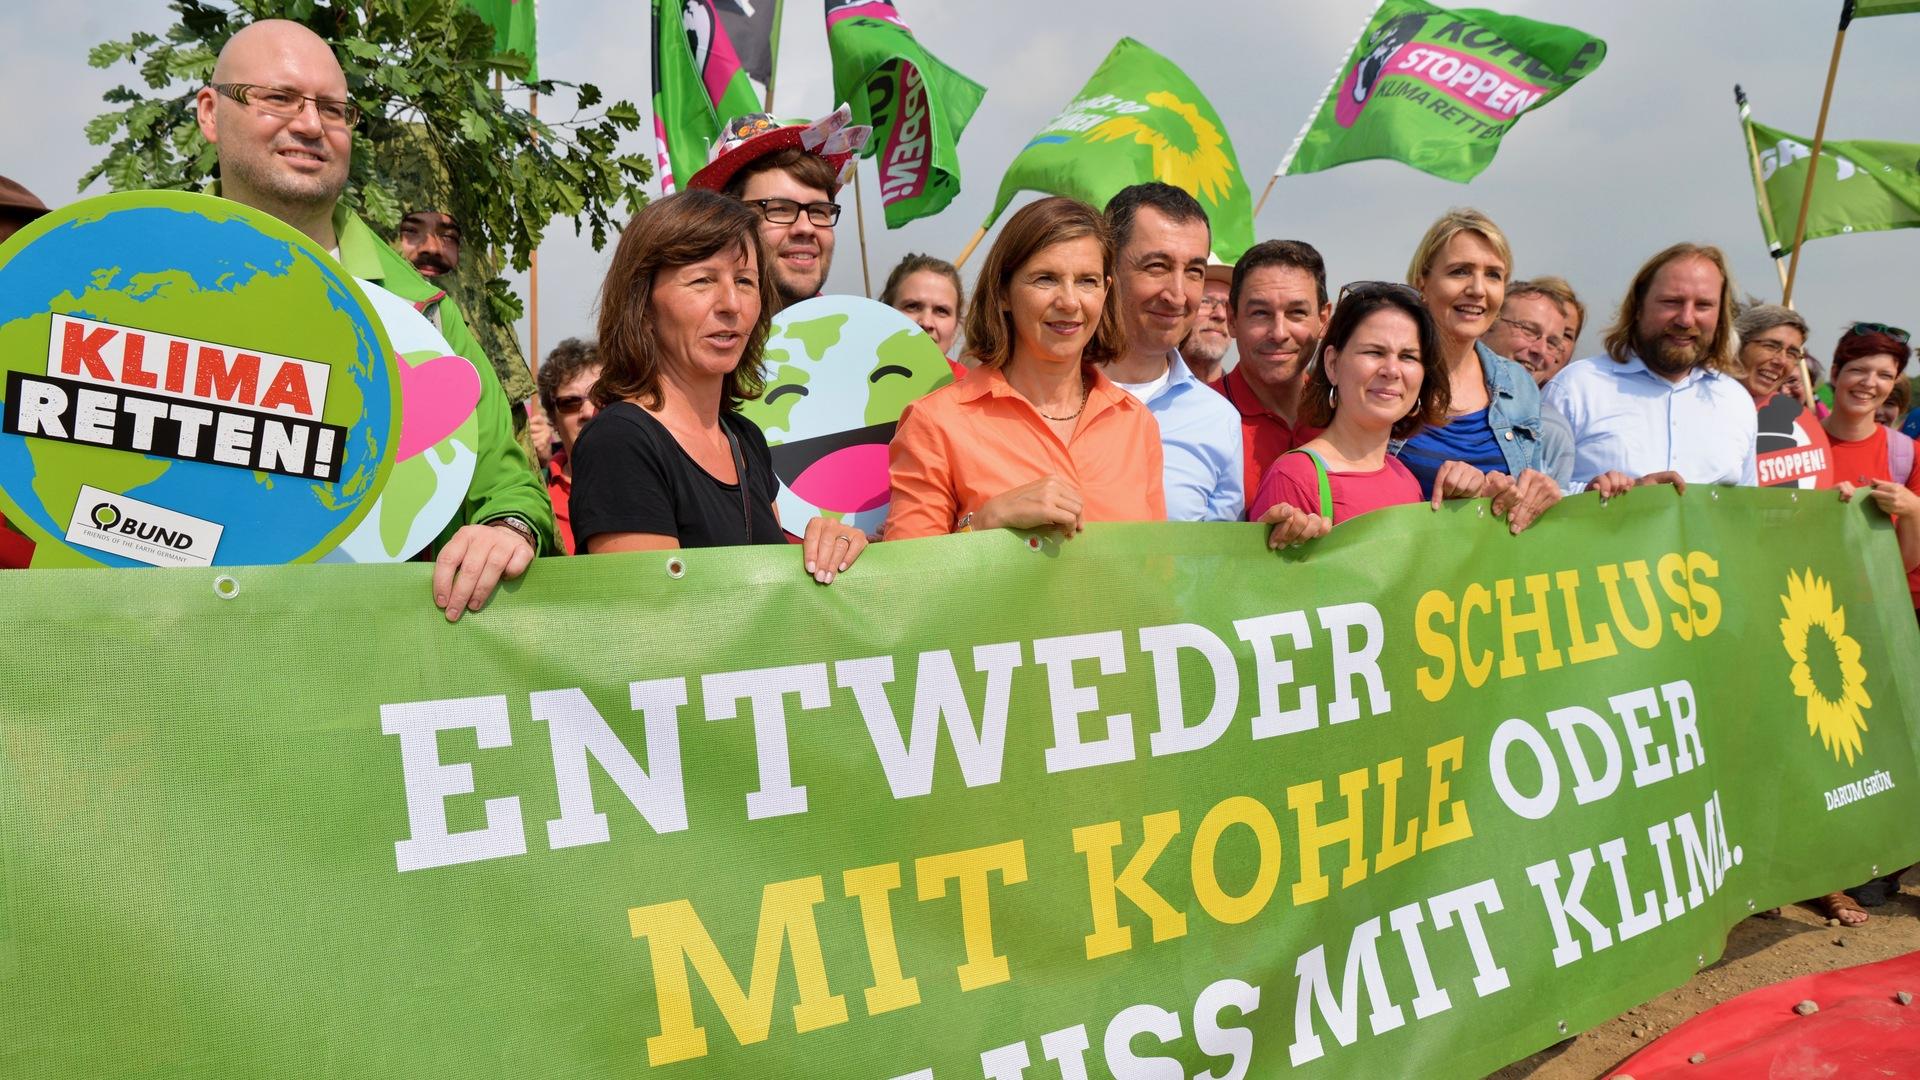 RÆSONs Nyhedsbrev om det tyske valg: Kampen om tredjepladsen